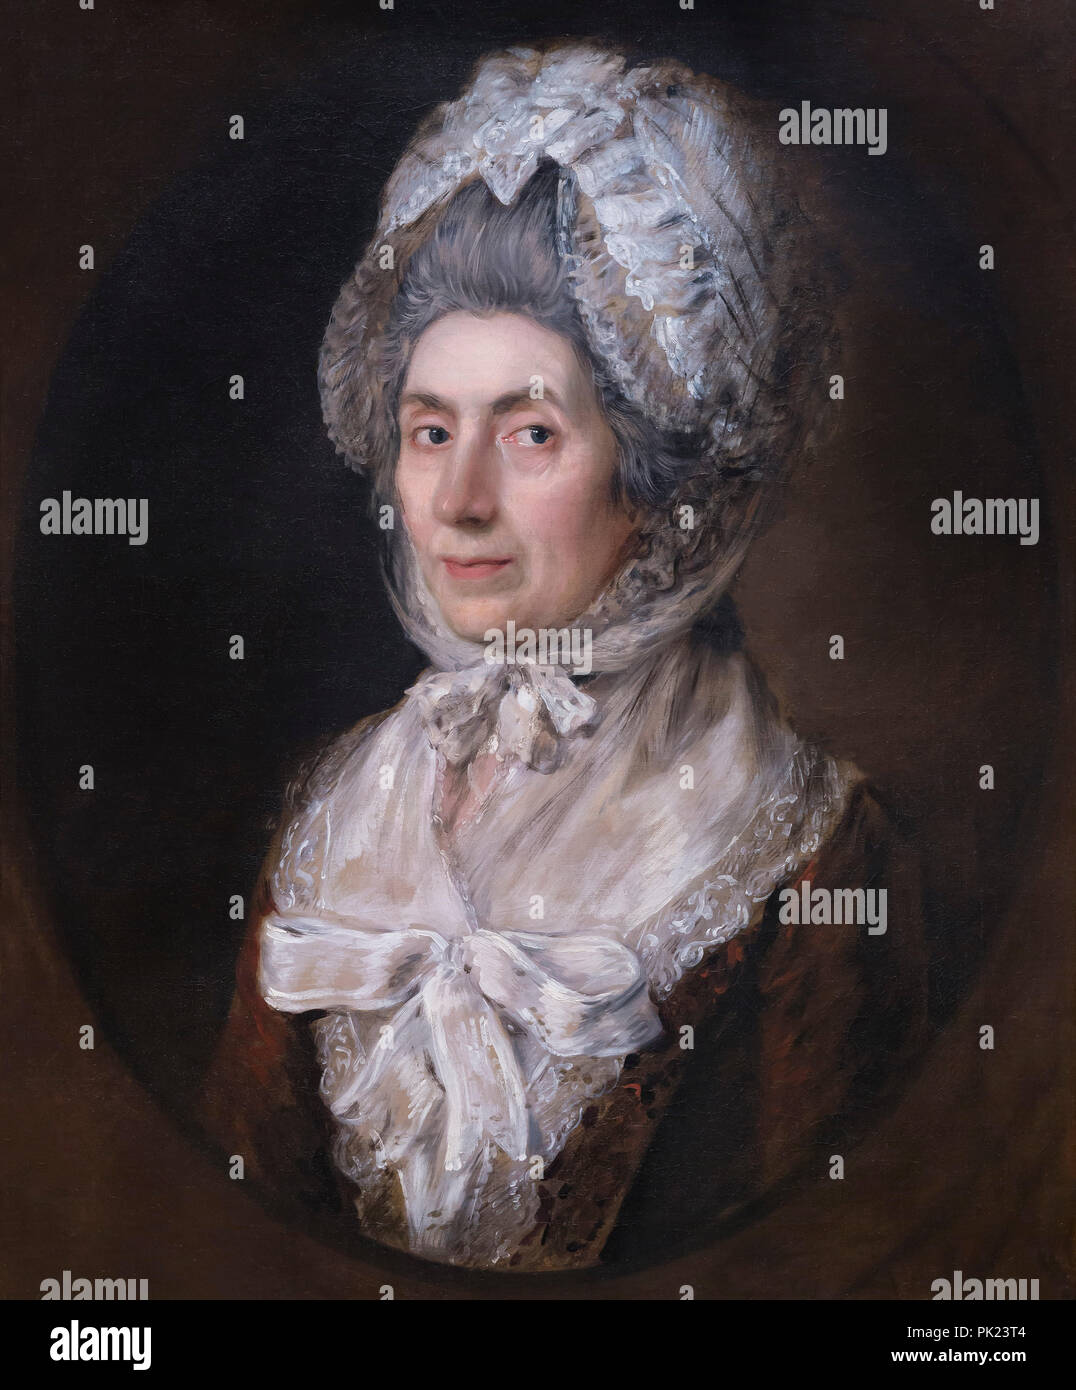 Frau Philipp Dupont, Thomas Gainsborough, circa 1778, Kunst Institut von Chicago, Chicago, Illinois, USA, Nordamerika, Stockbild